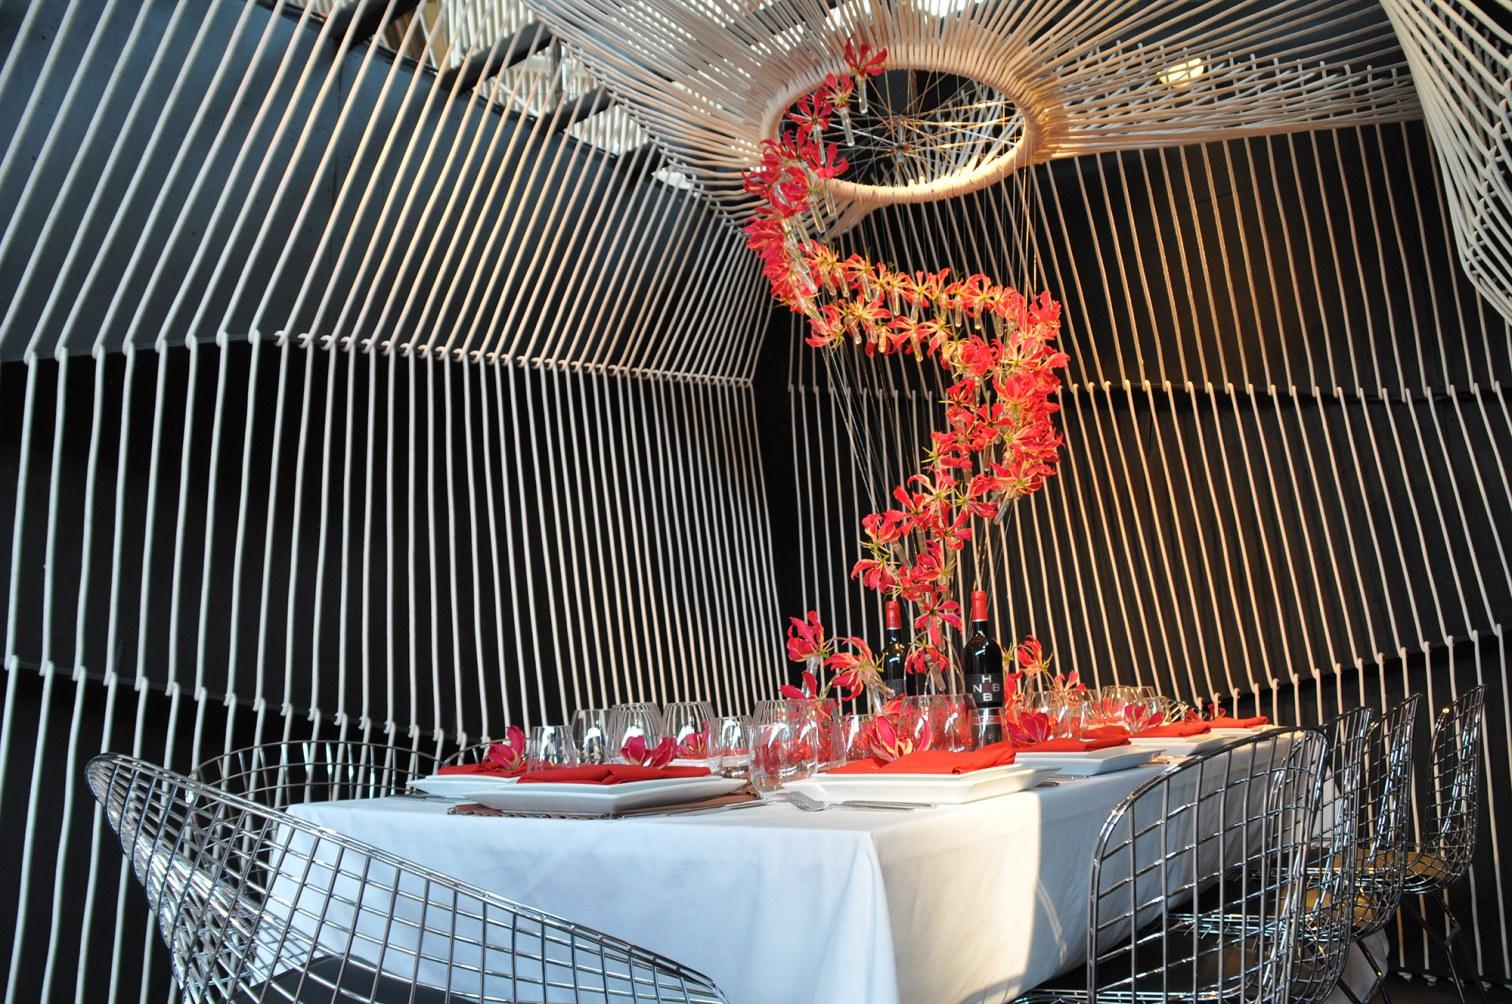 Diffa Dining By Design 2010 Arpad Baksa Architect Pc